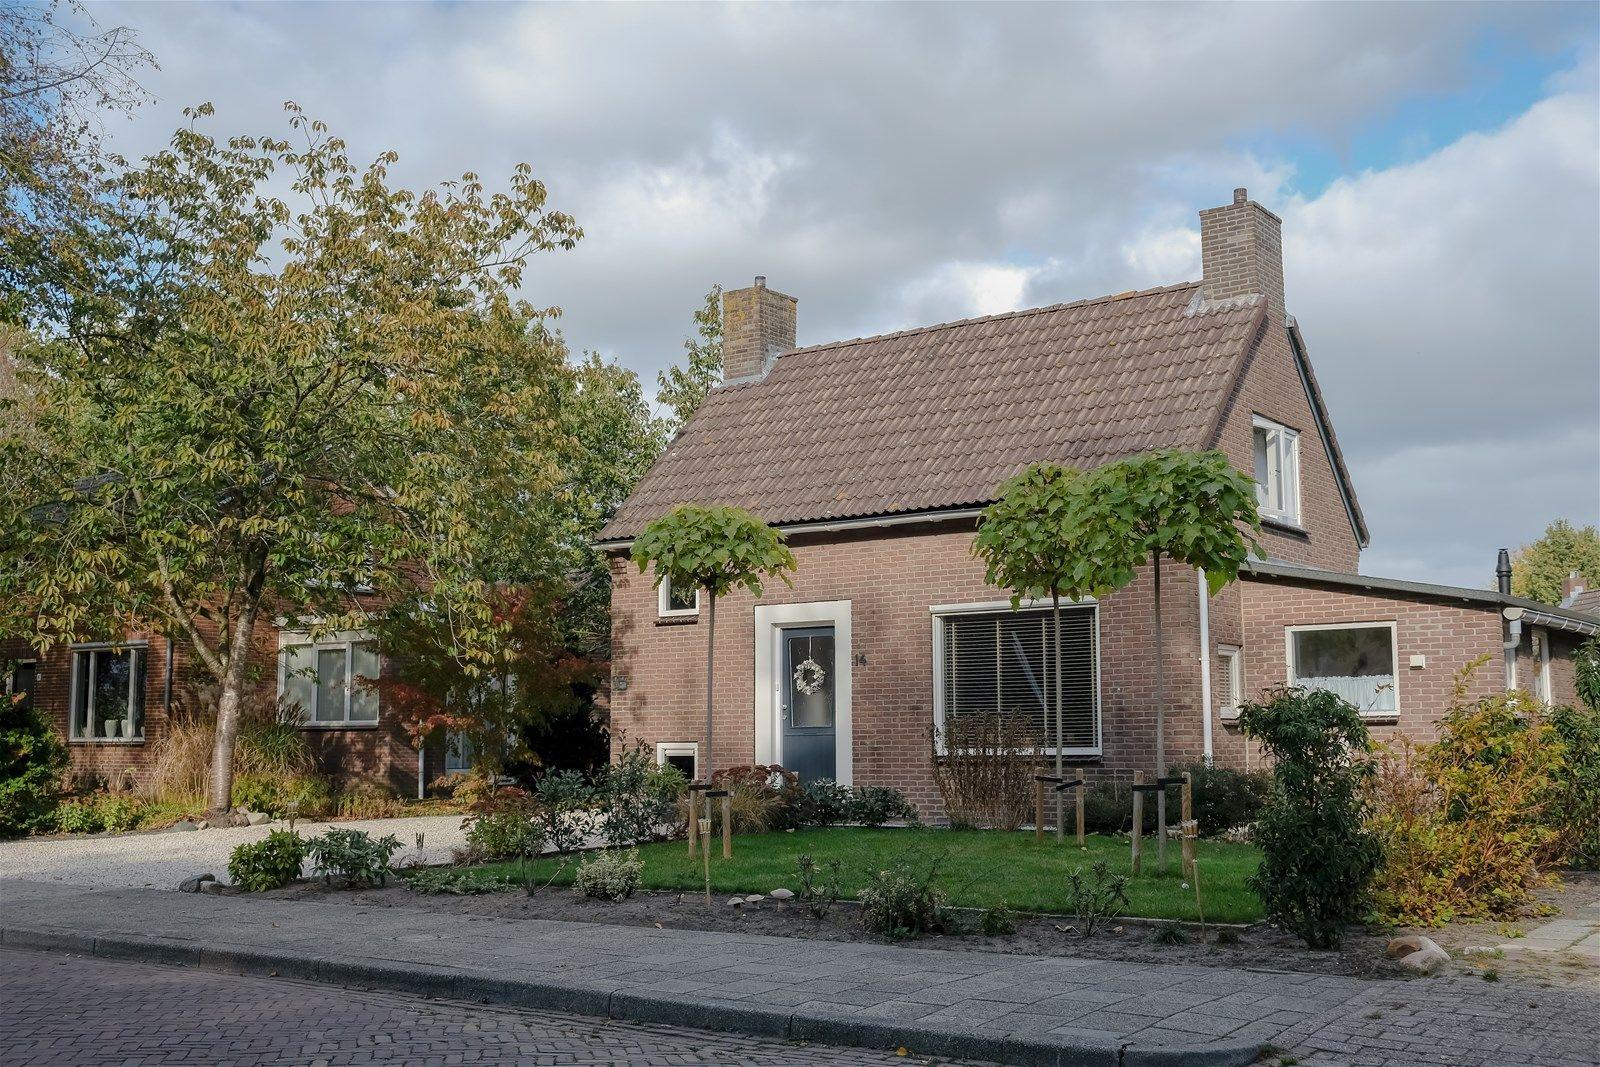 Westerveldseweg 14, Zuidwolde